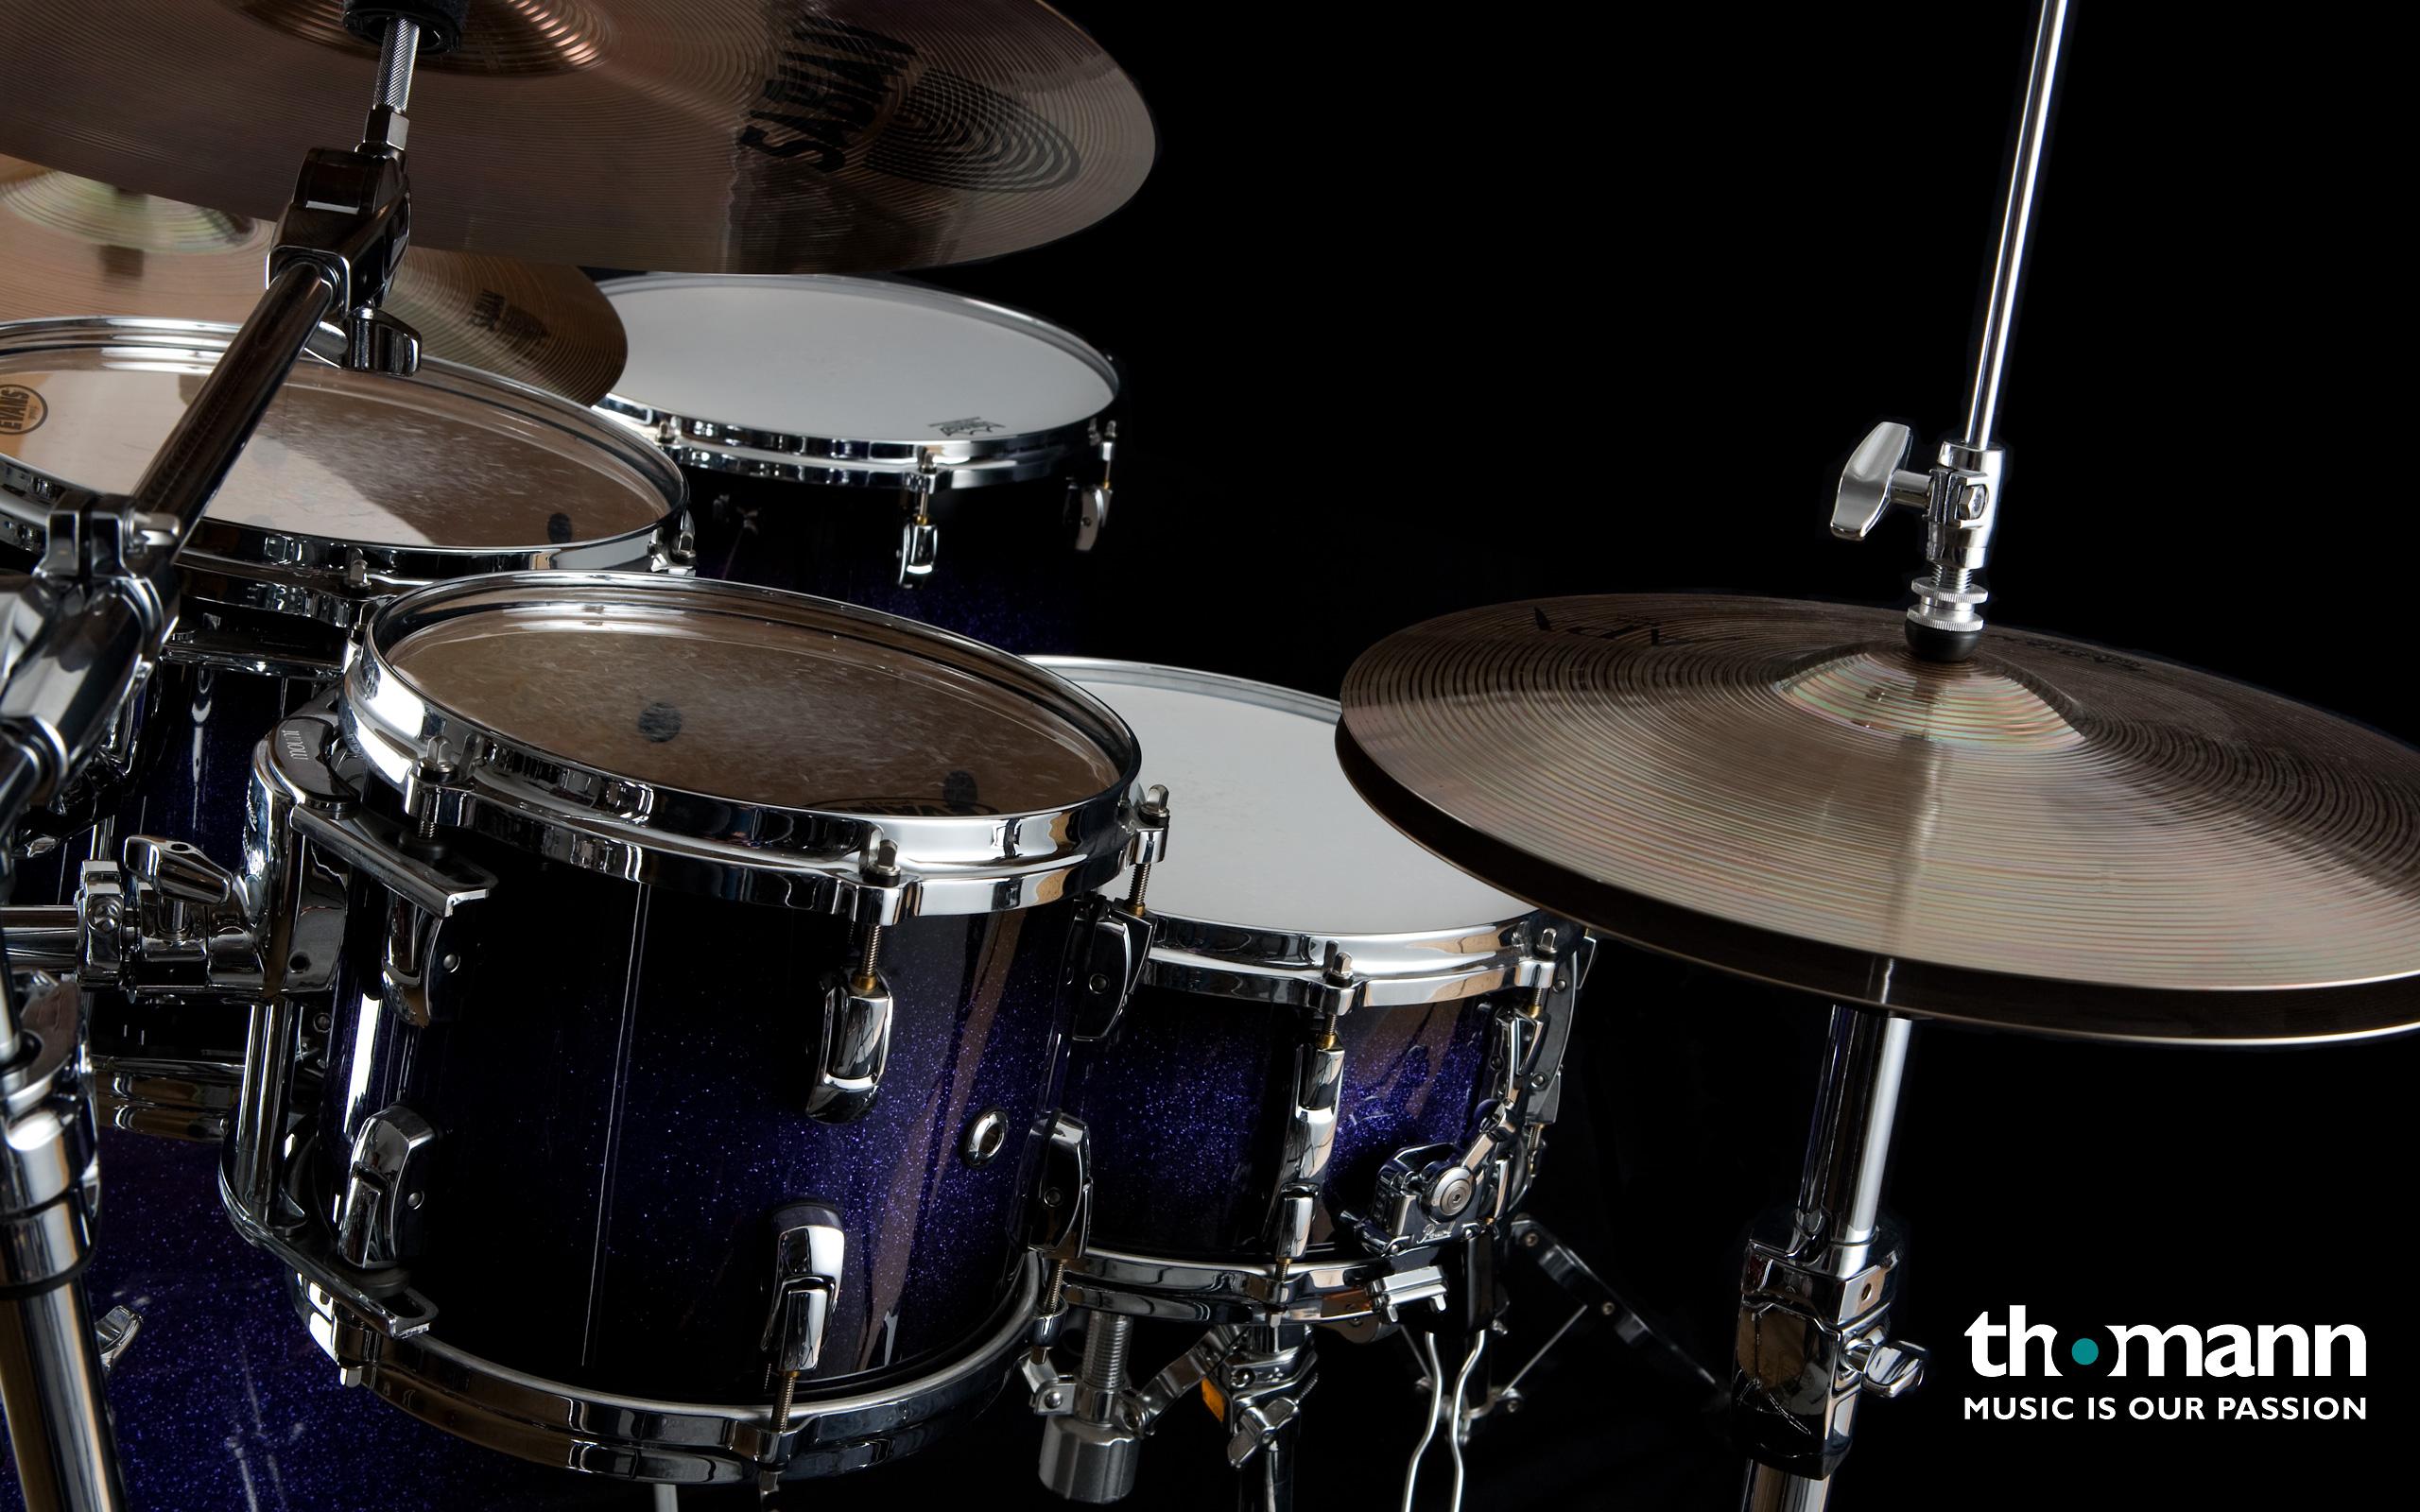 Drum Set Pearl Drums Wallpapers 25601600 Best wallpaper 2560x1600